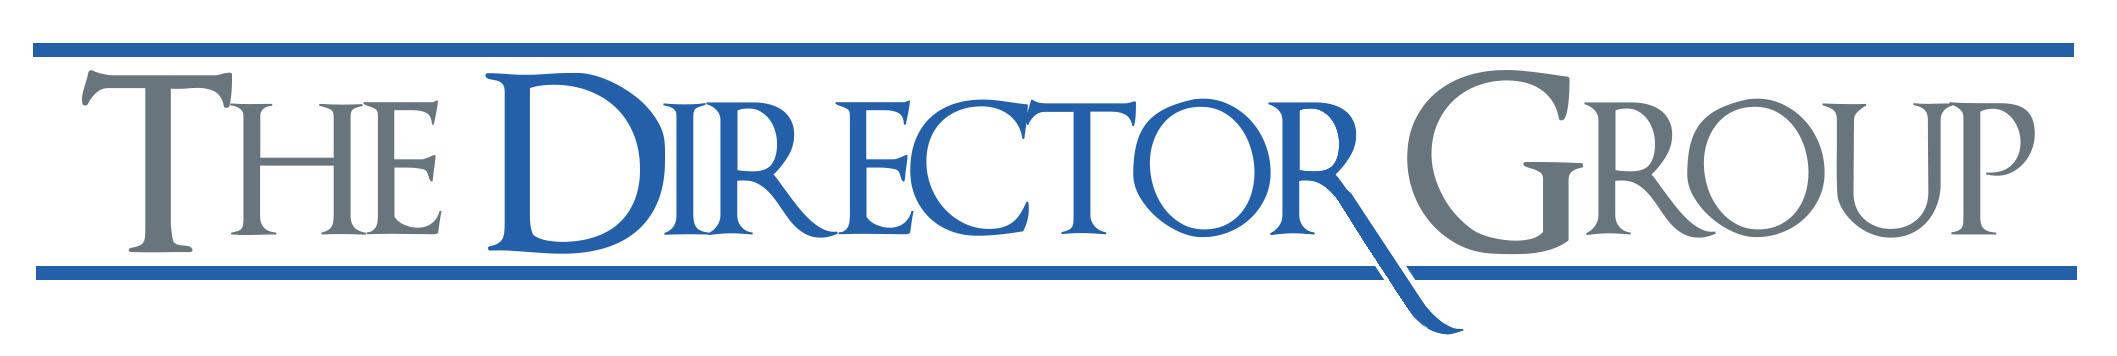 Director Group logo